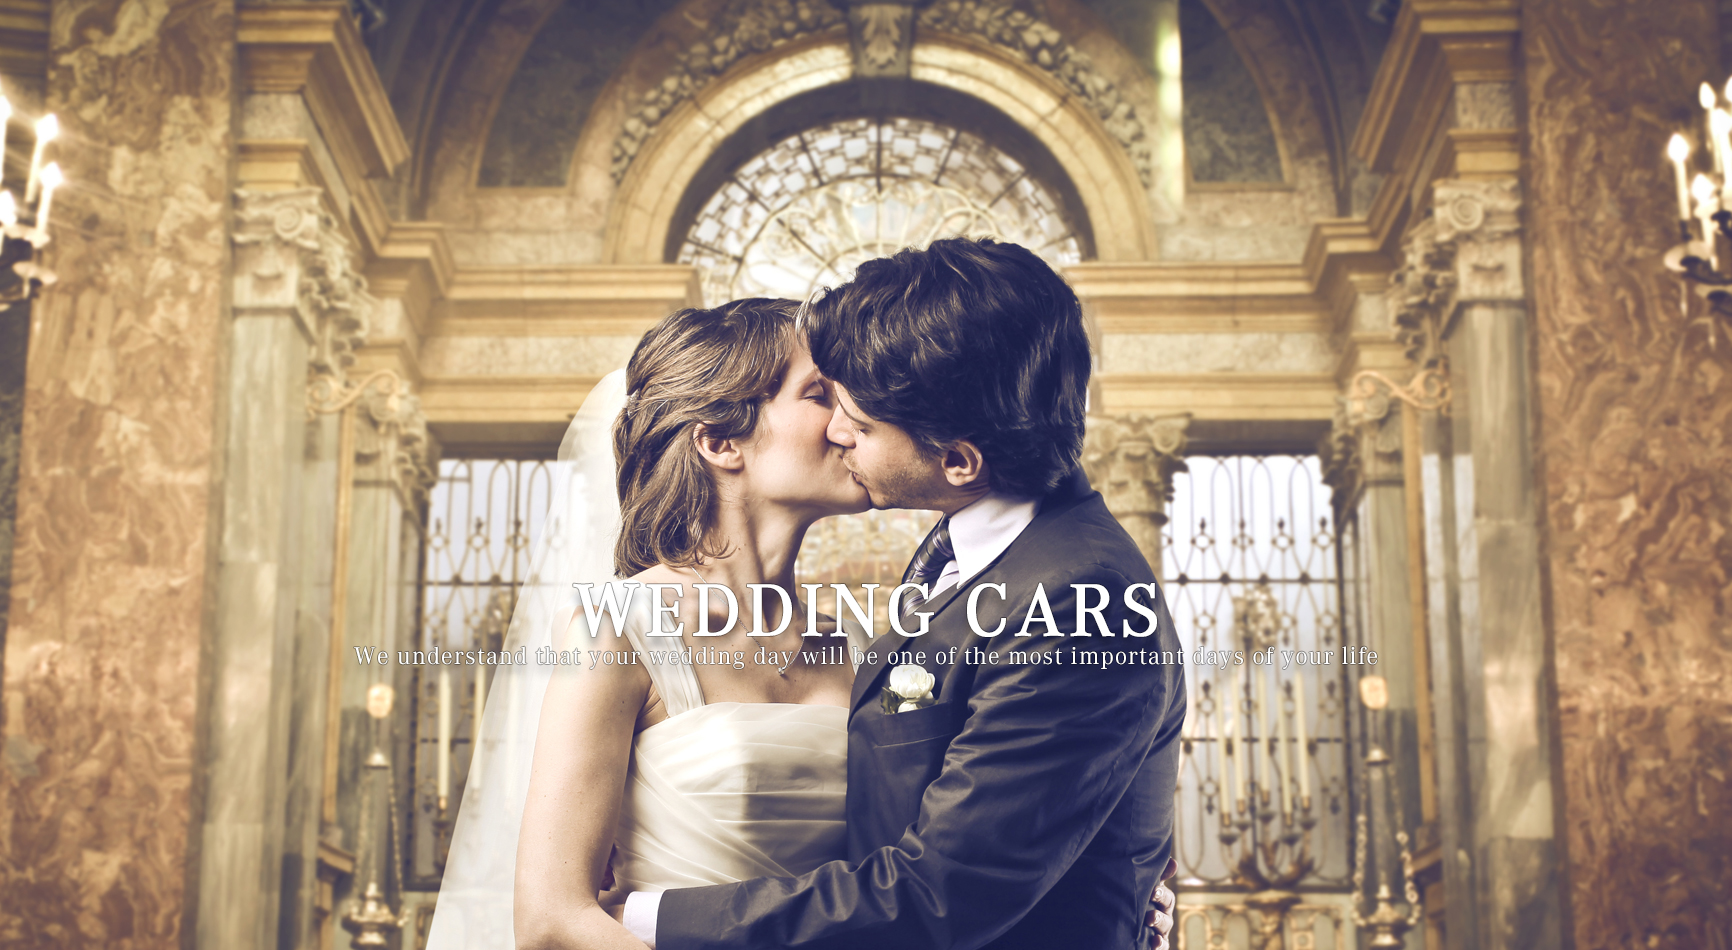 hm-wedding-banner-3